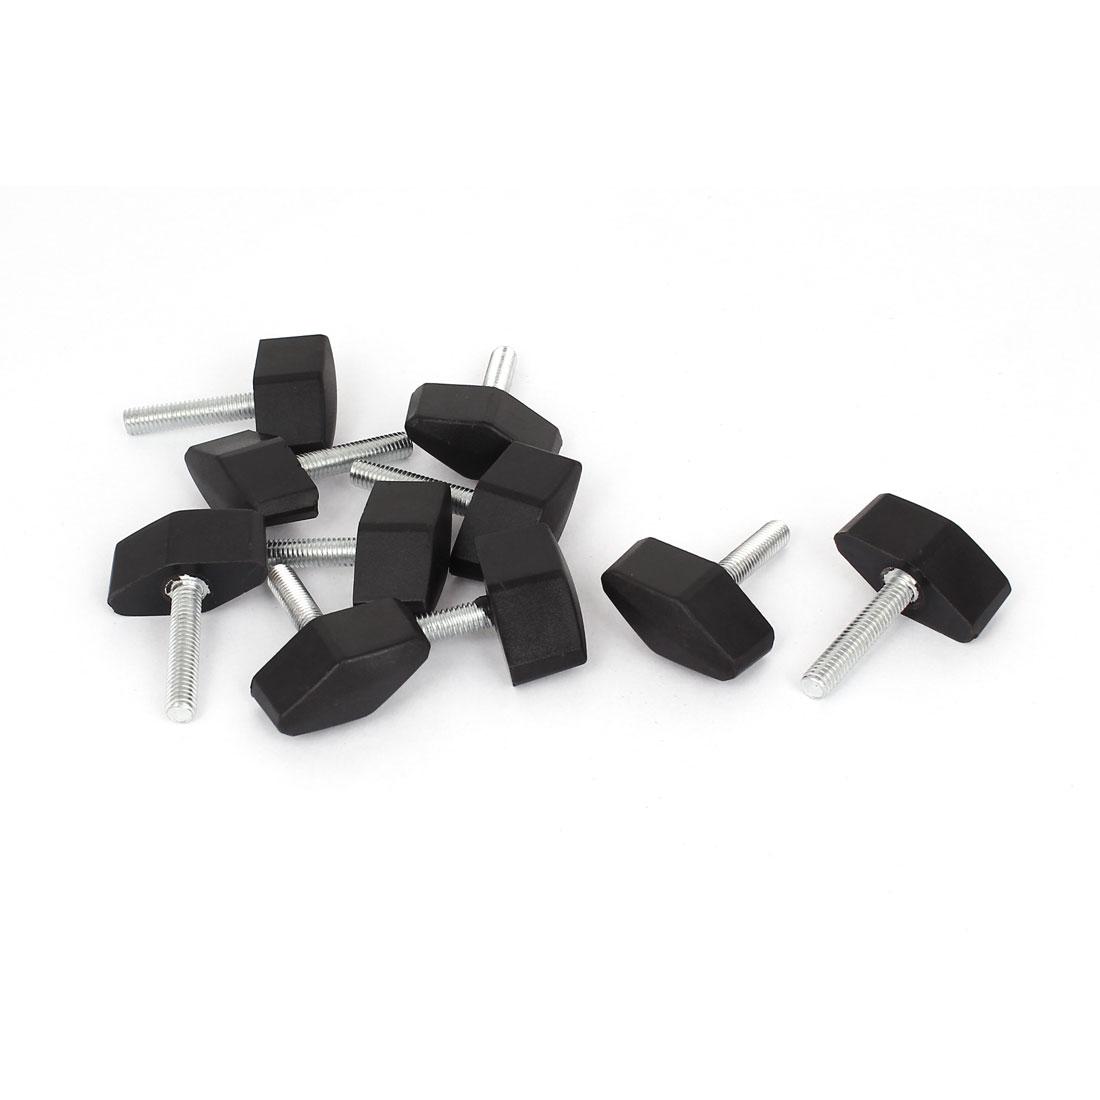 M6 x 30mm Thread Screw Rotating Adjustable Clamping Handle Knob 10 Pcs